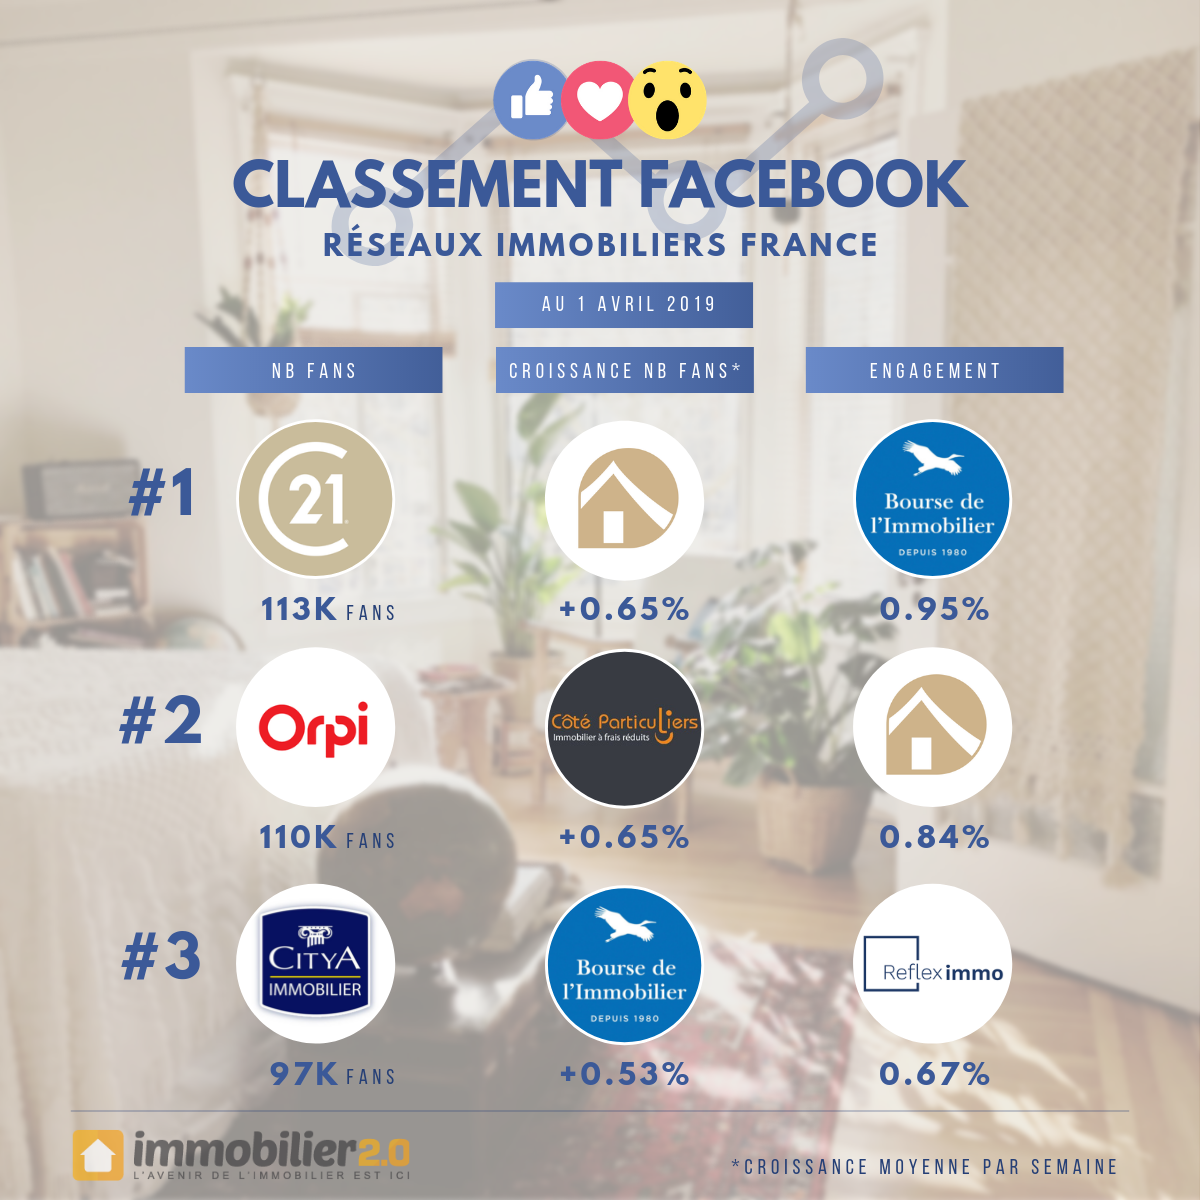 Classement Facebook Reseaux Immobiliers France Avril 2019